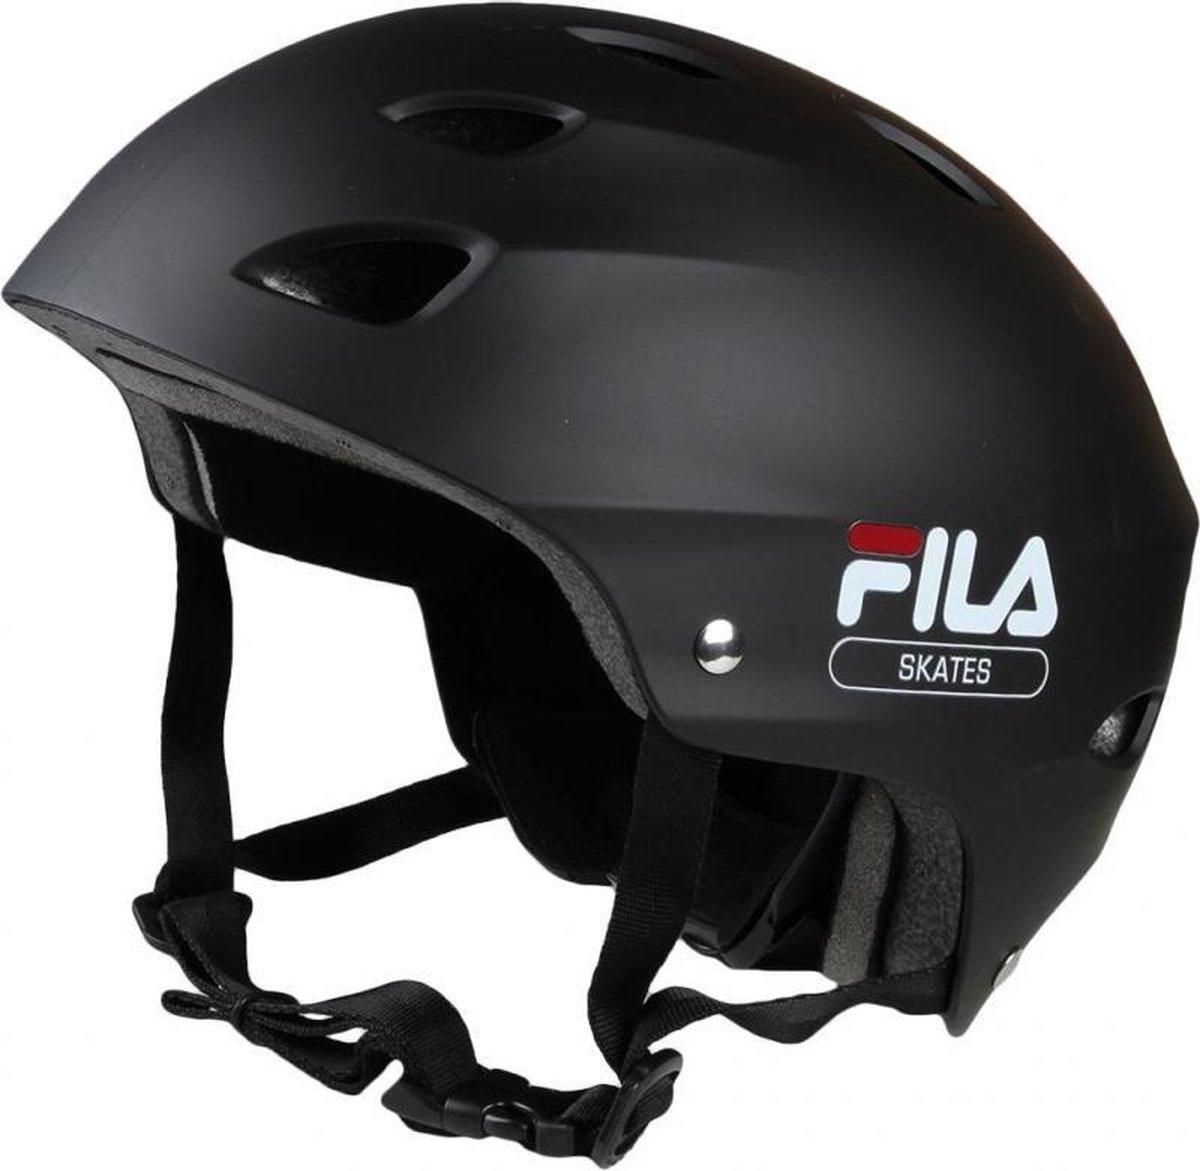 Fila Urban Skate Helmet